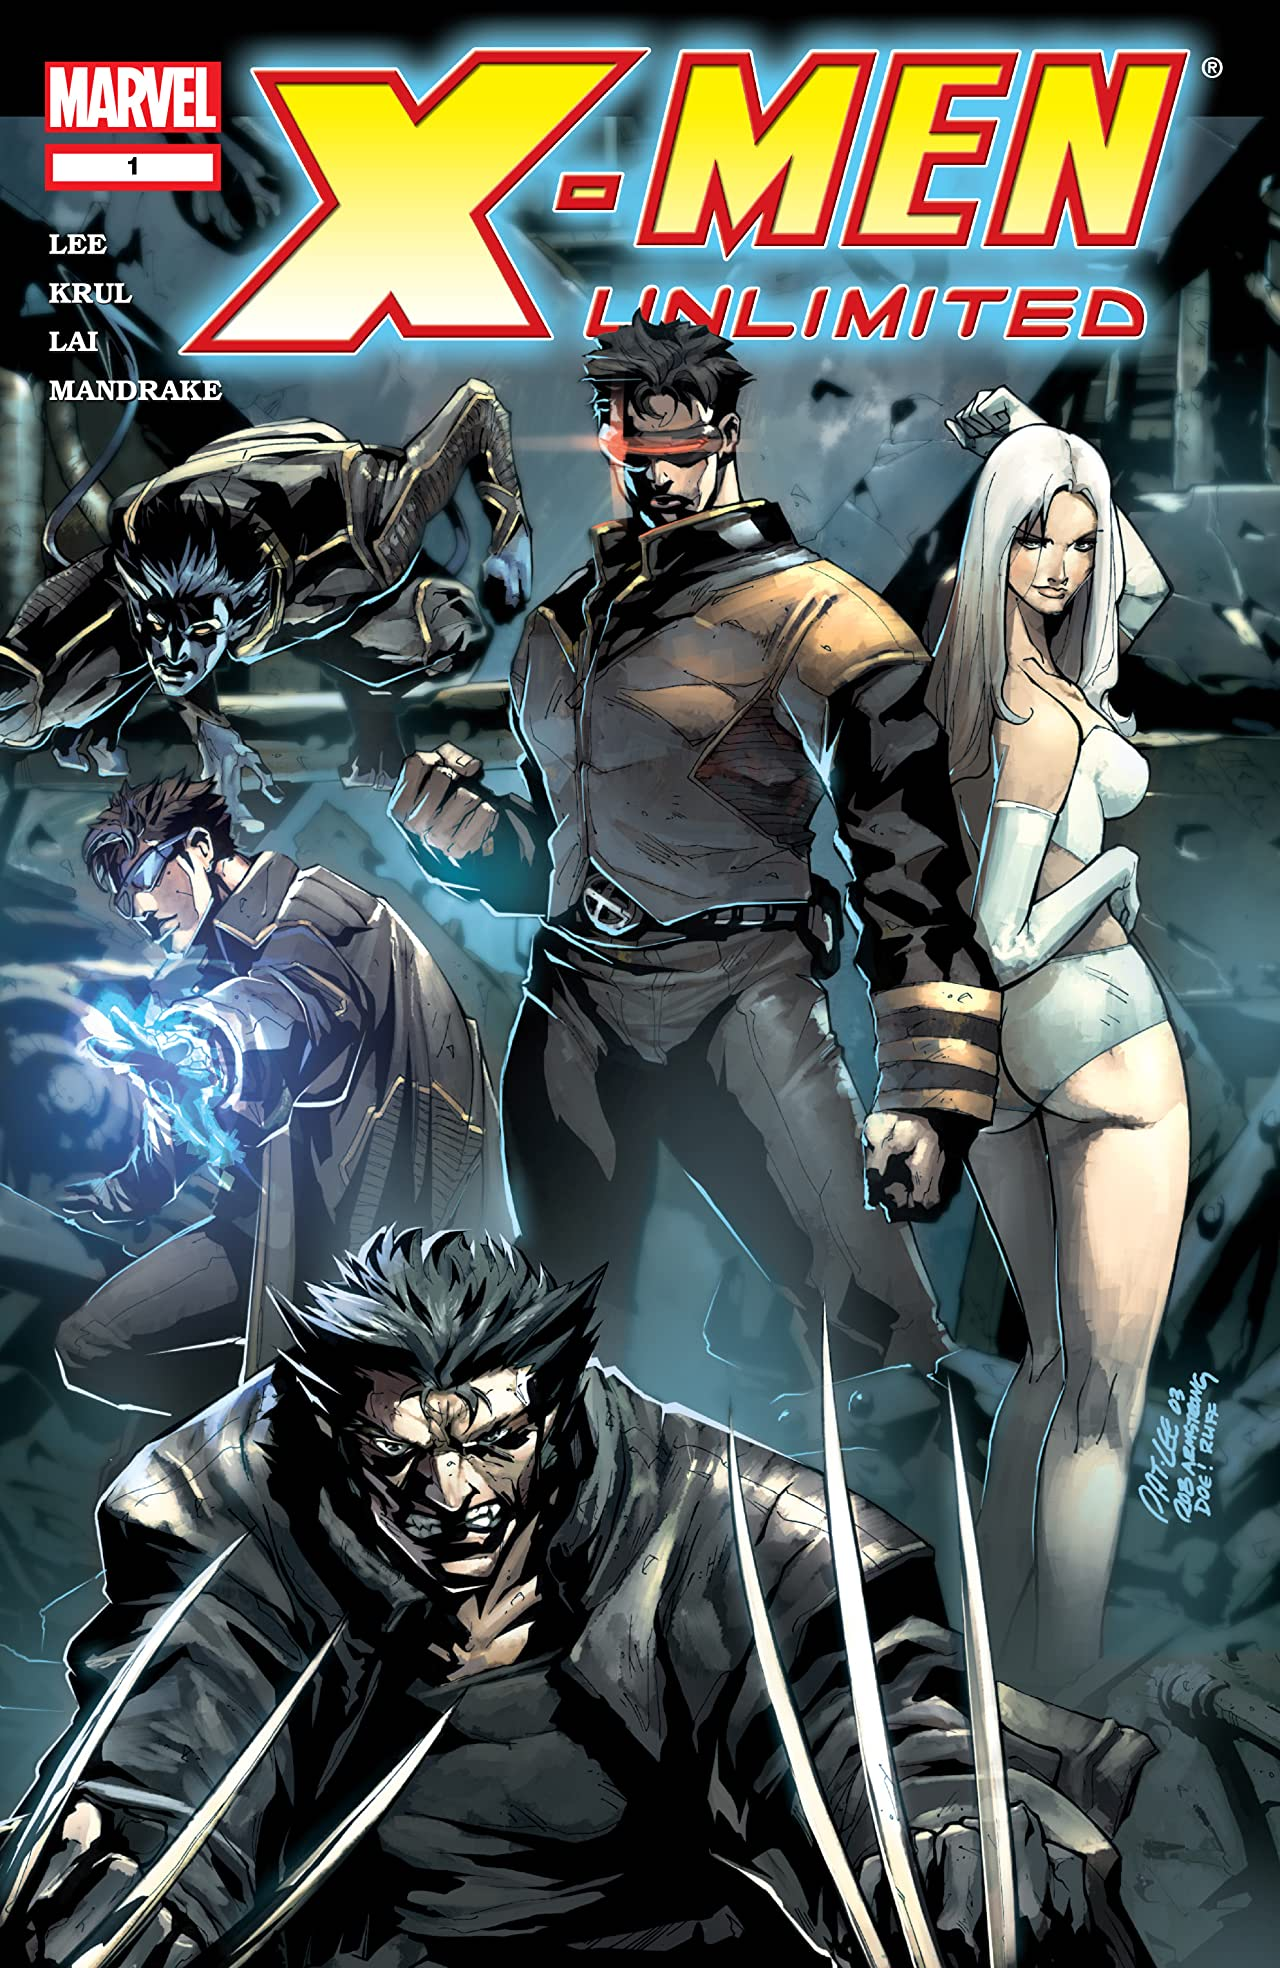 X-Men Unlimited (2004-2006) #1